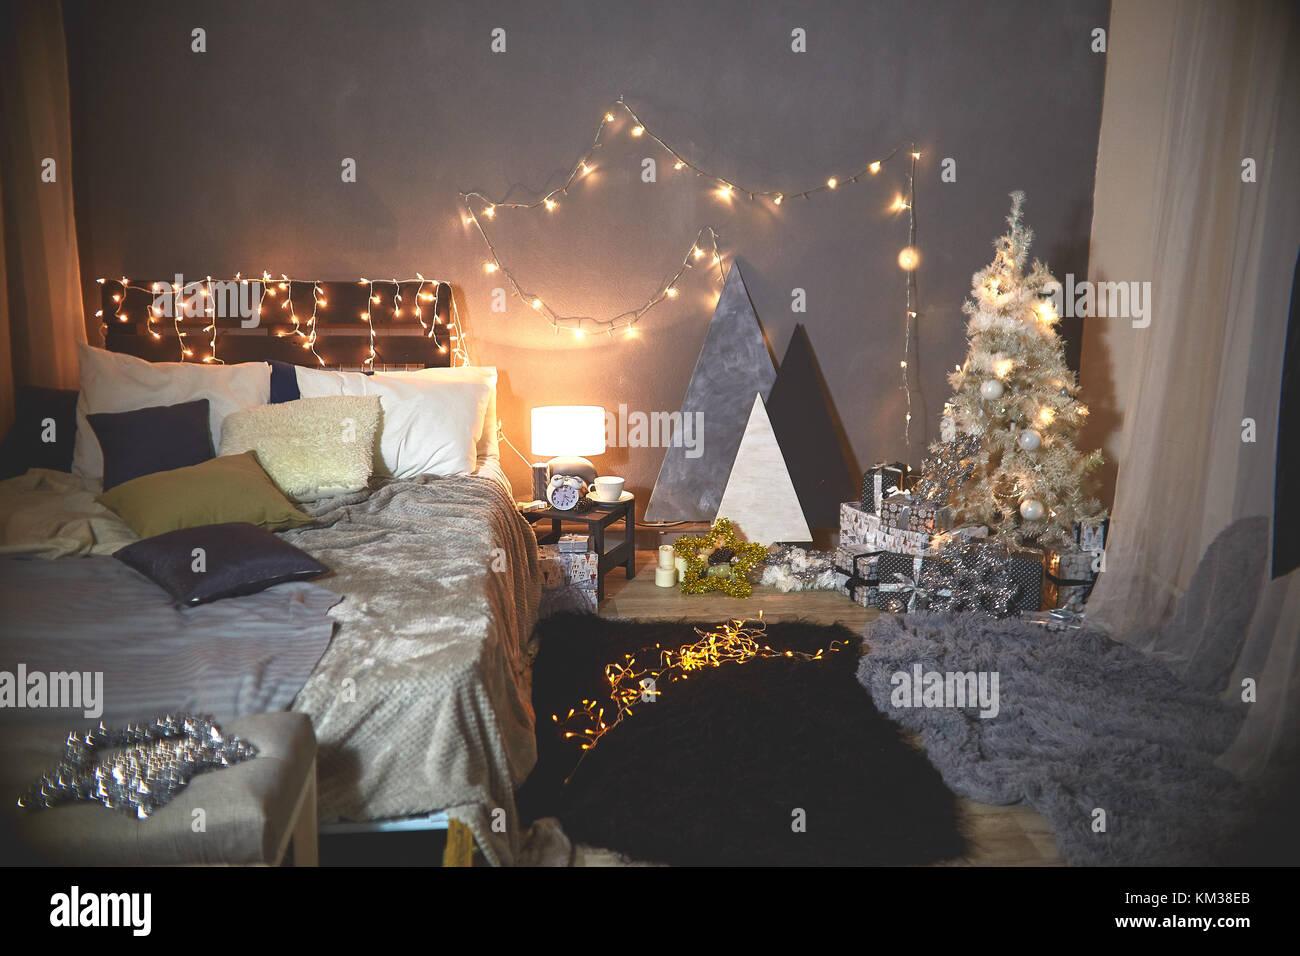 bulbs mirror stock photos bulbs mirror stock images alamy. Black Bedroom Furniture Sets. Home Design Ideas